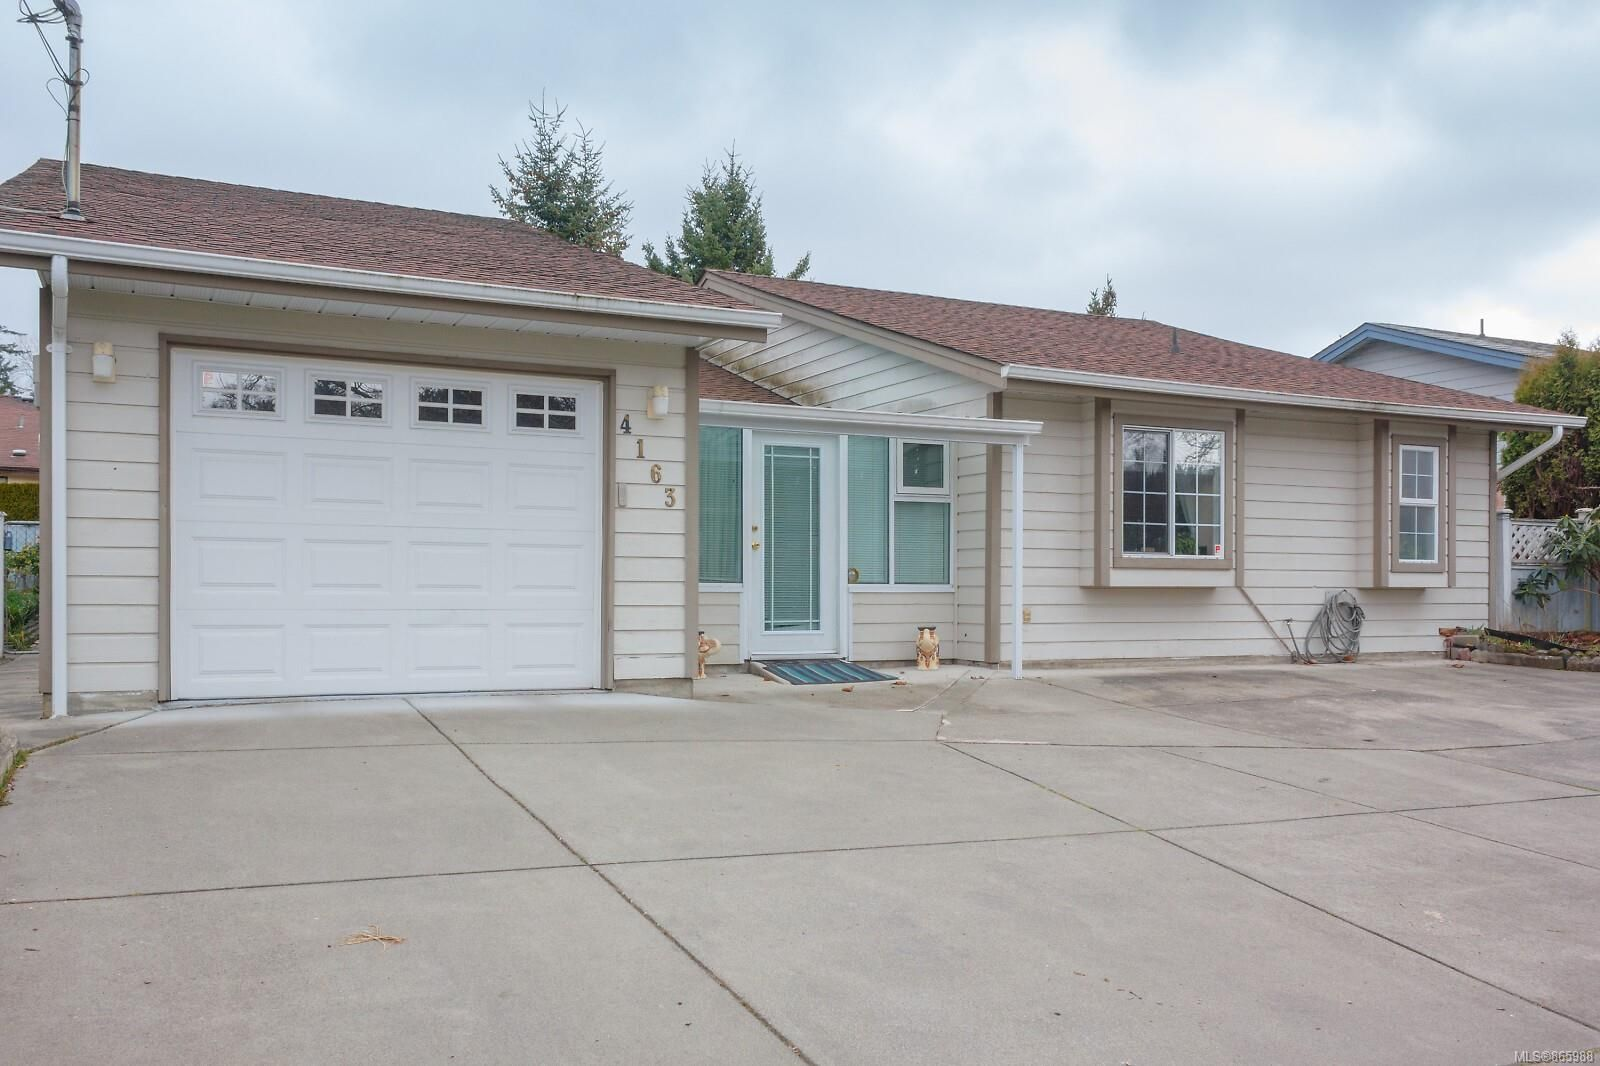 Main Photo: 4163 Shelbourne St in : SE Gordon Head House for sale (Saanich East)  : MLS®# 865988